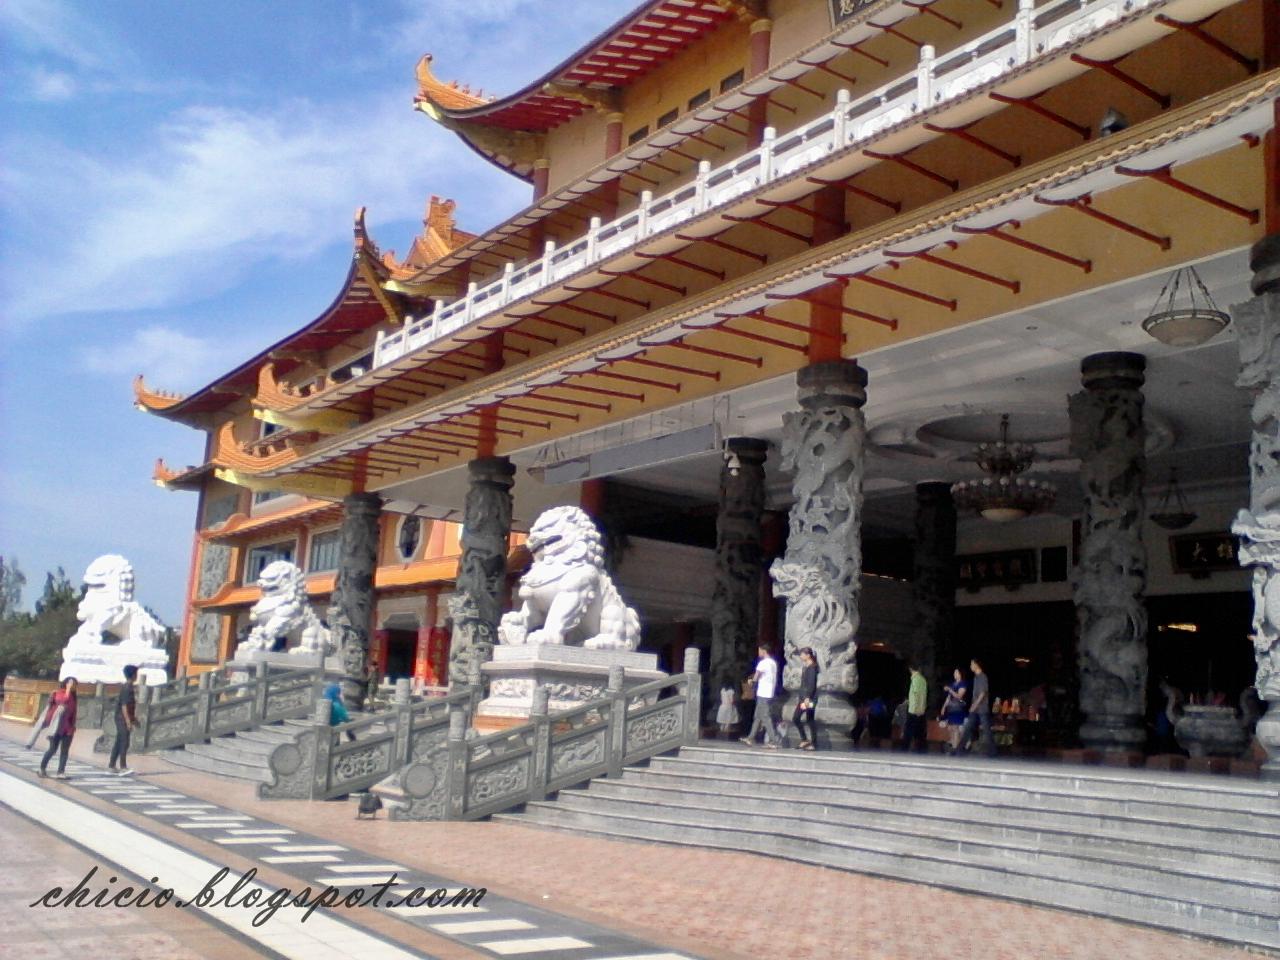 Langkah Kecil Chici Mengintip Keindahan Maha Vihara Adhi Maitreya Medan